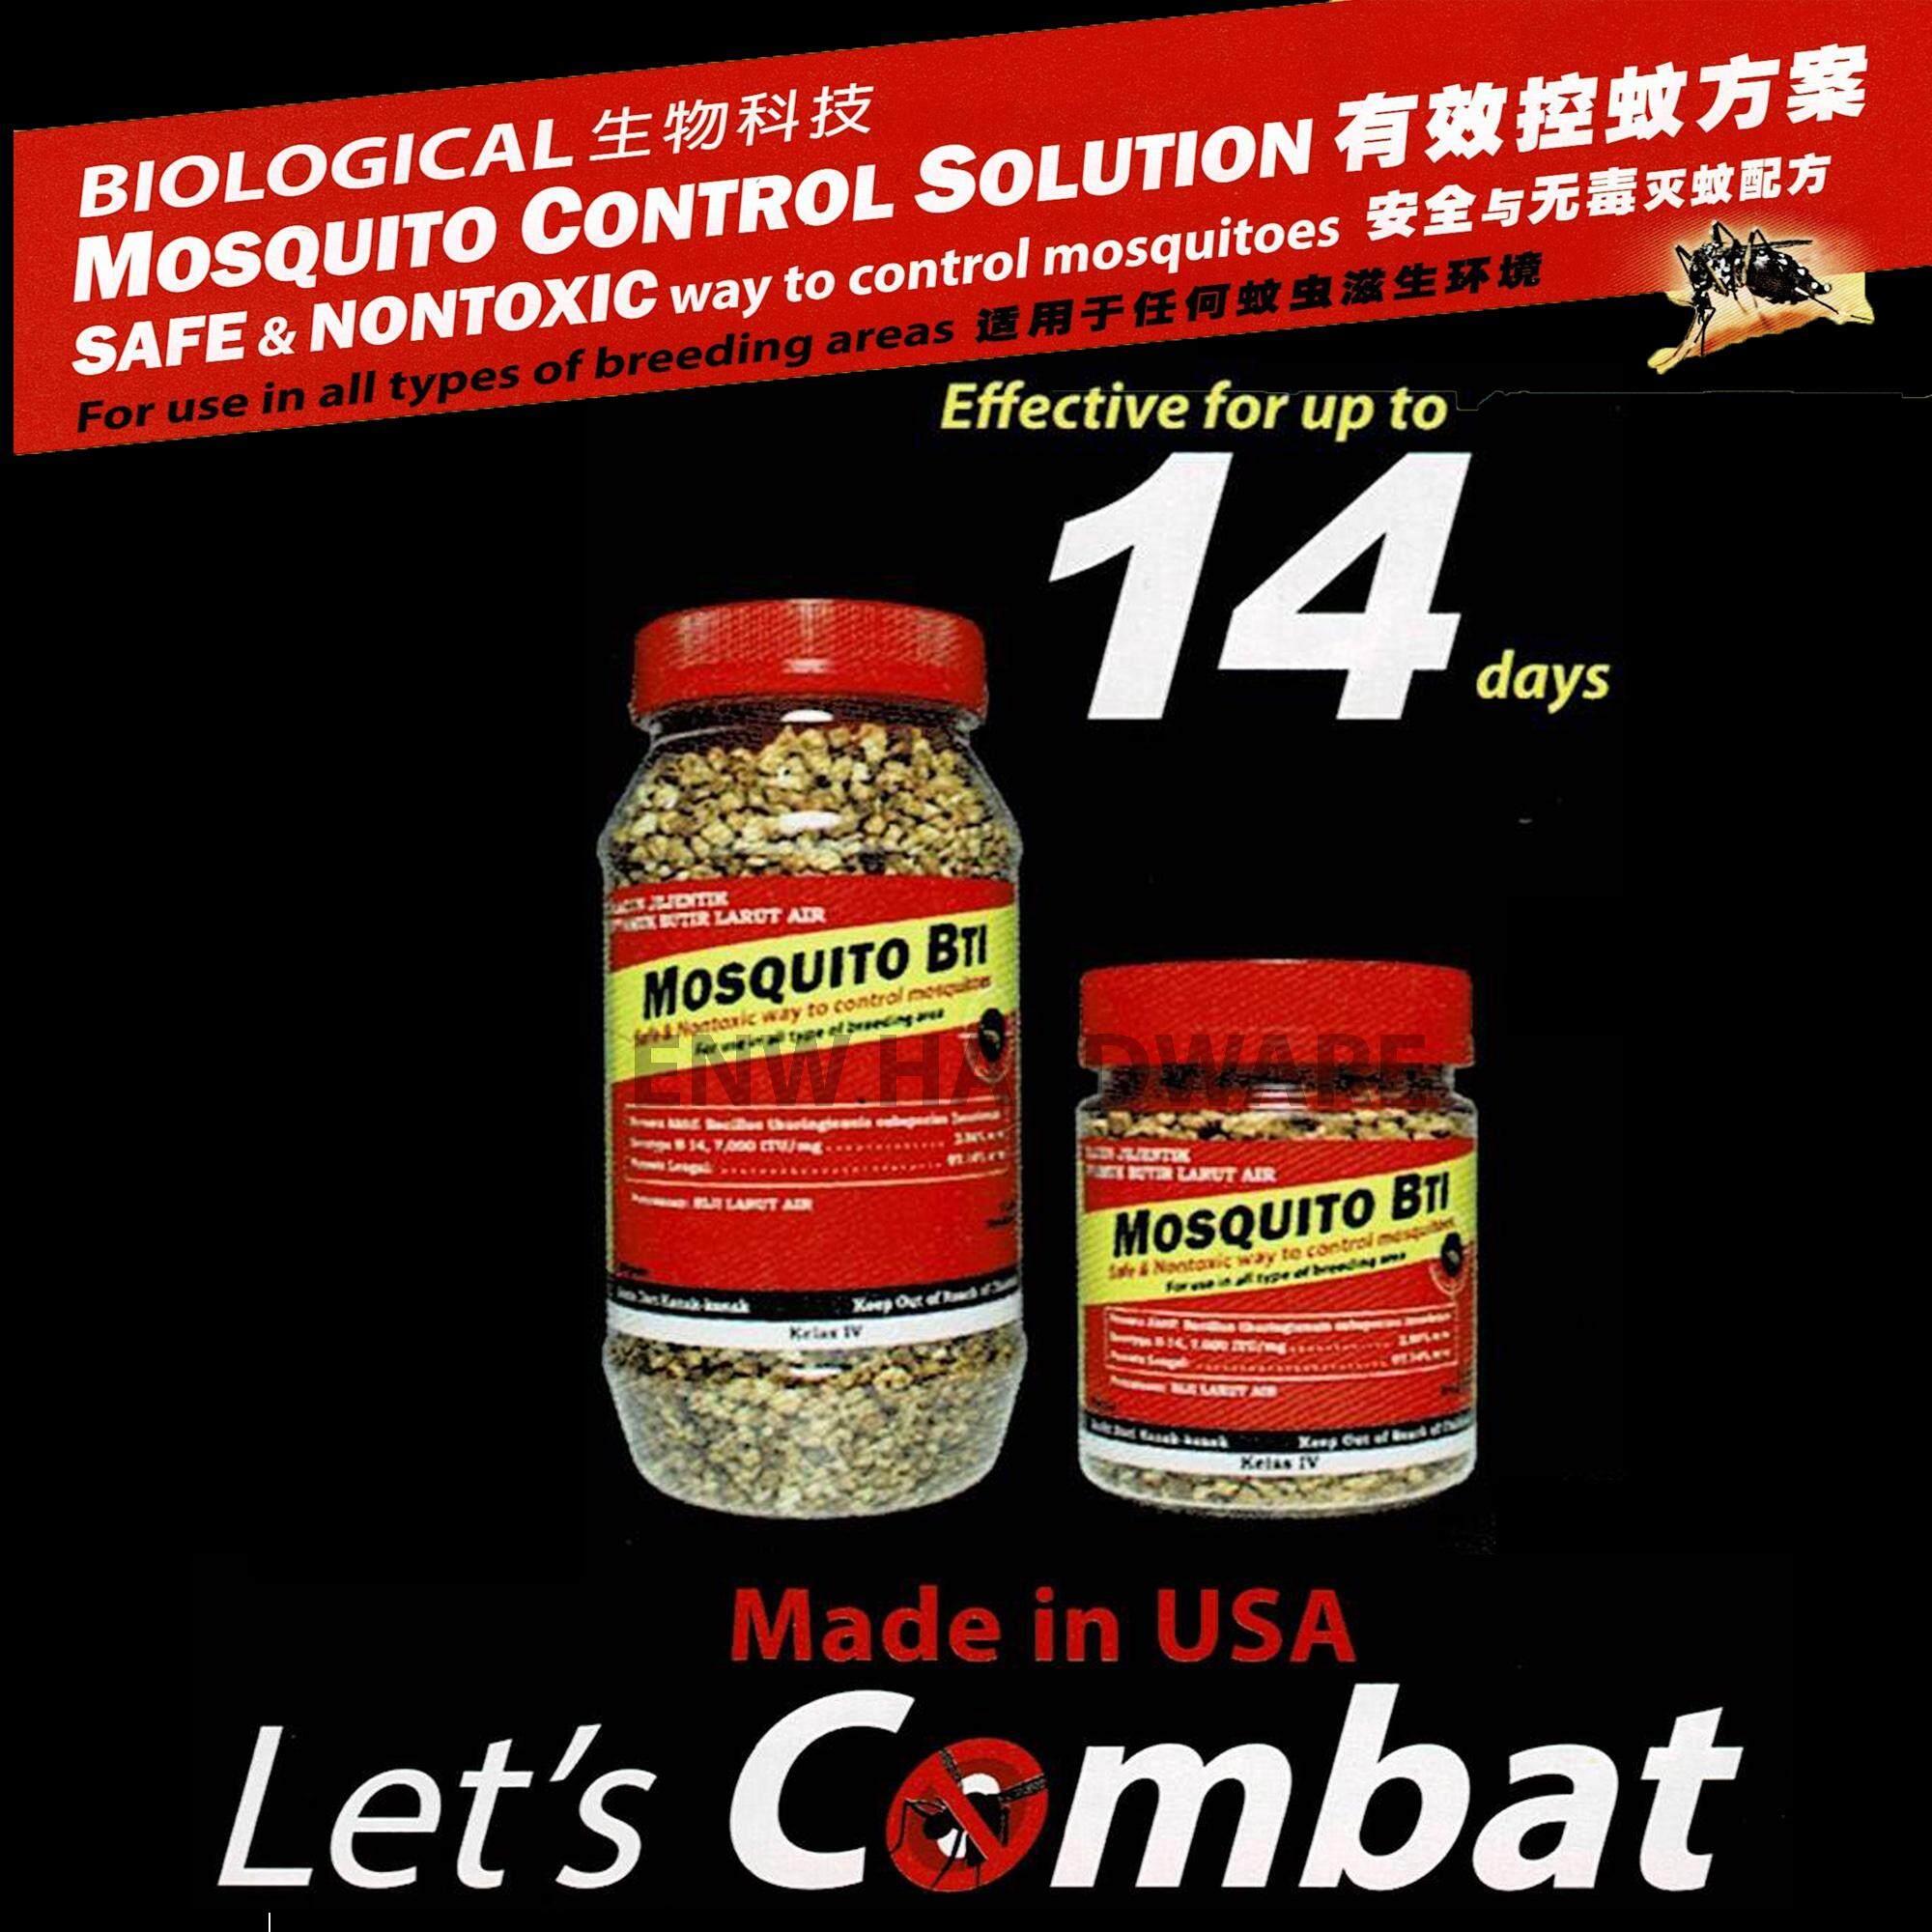 Non-Toxic Biological Mosquito Control Solution-Mosquito BTI 250gm